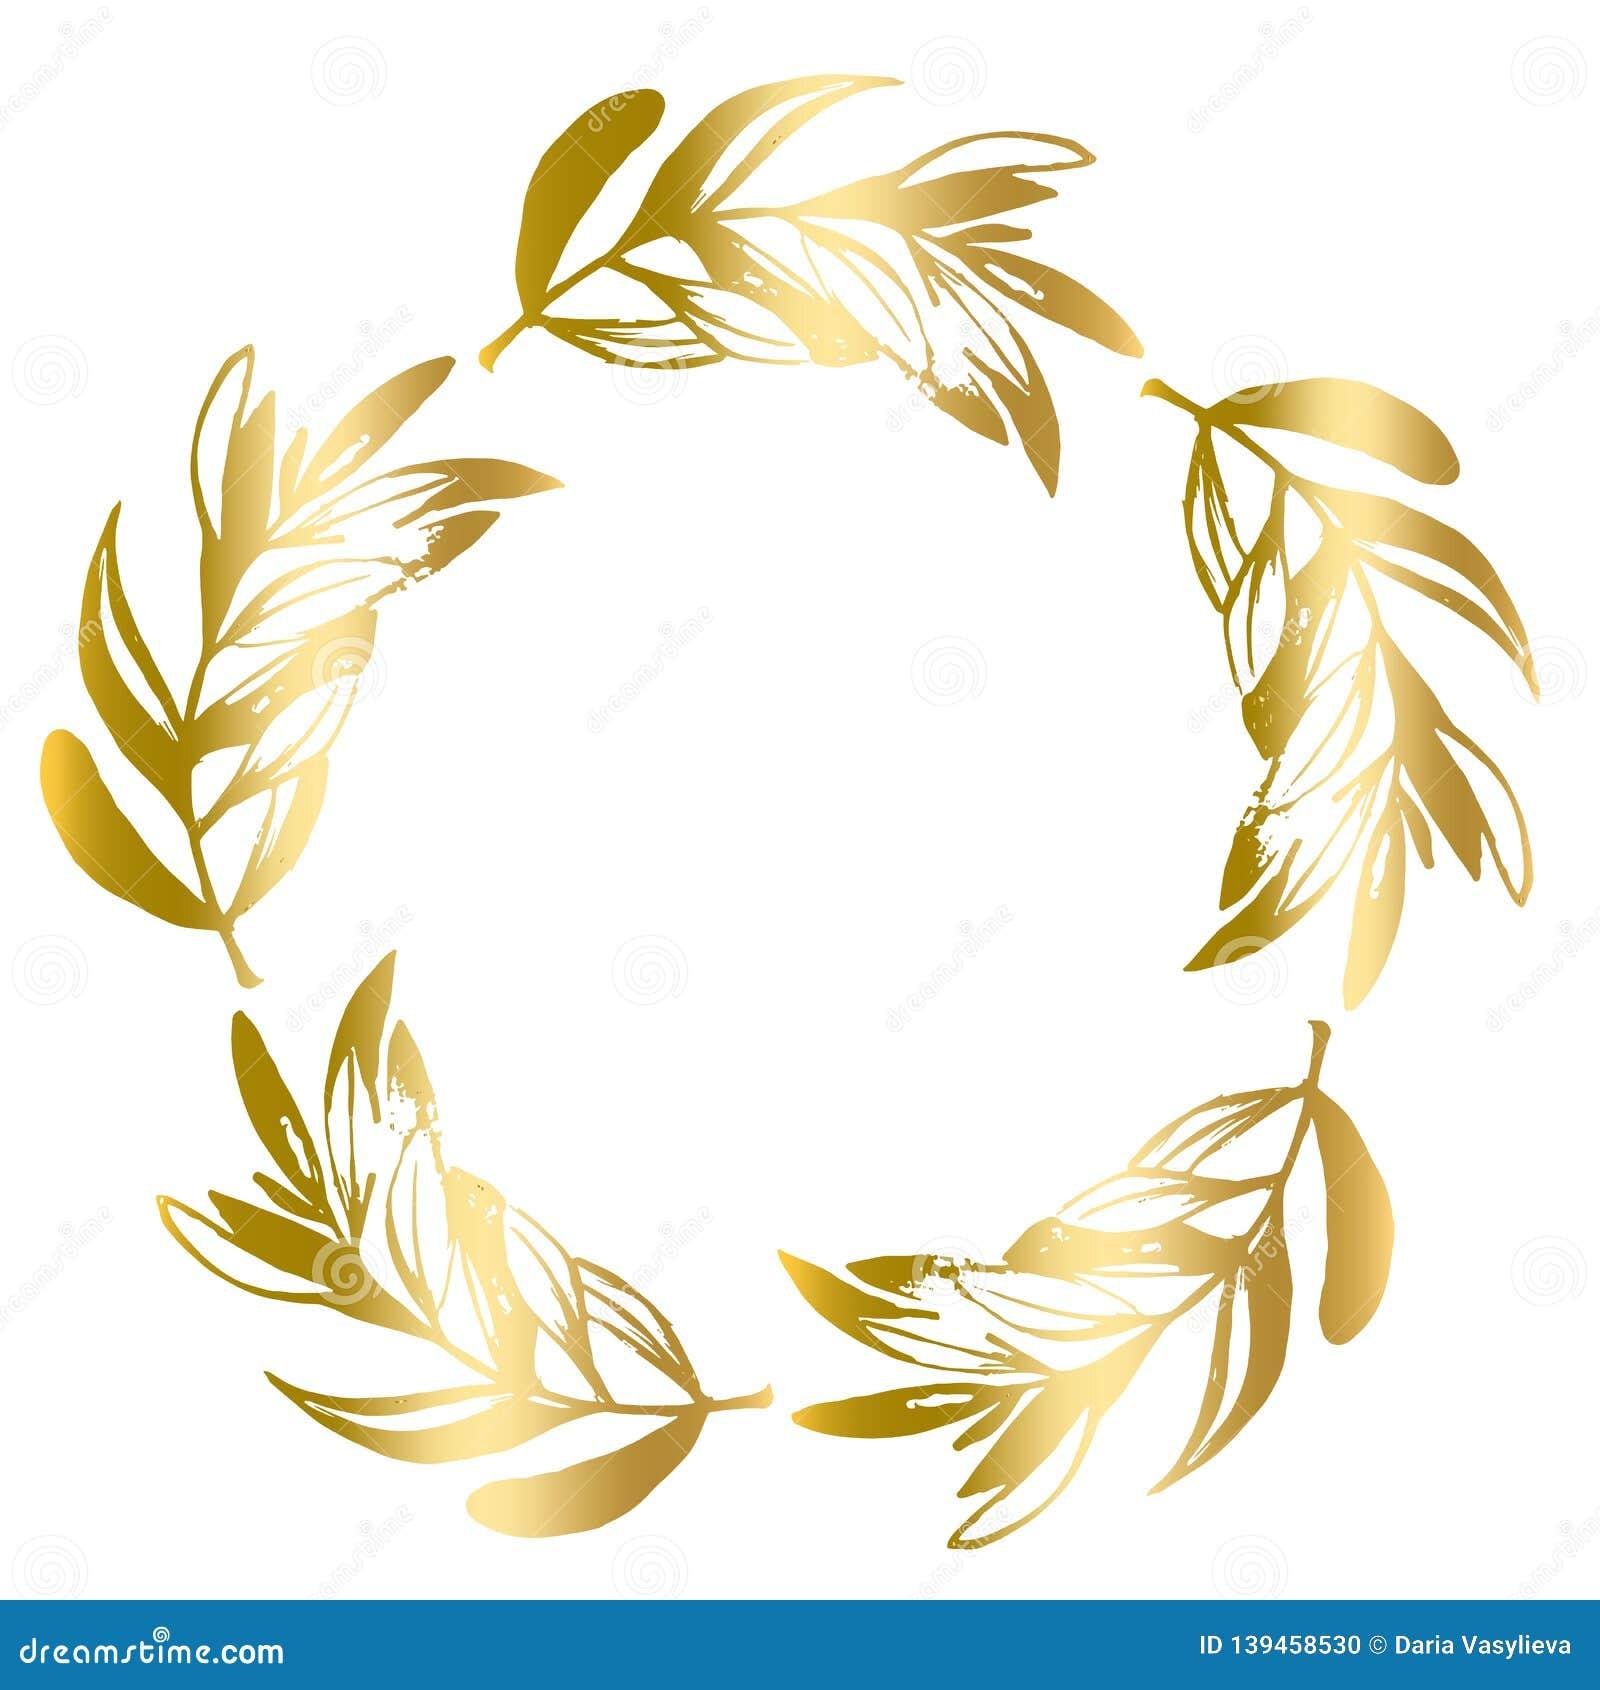 Golden round frame of olive leaves vector